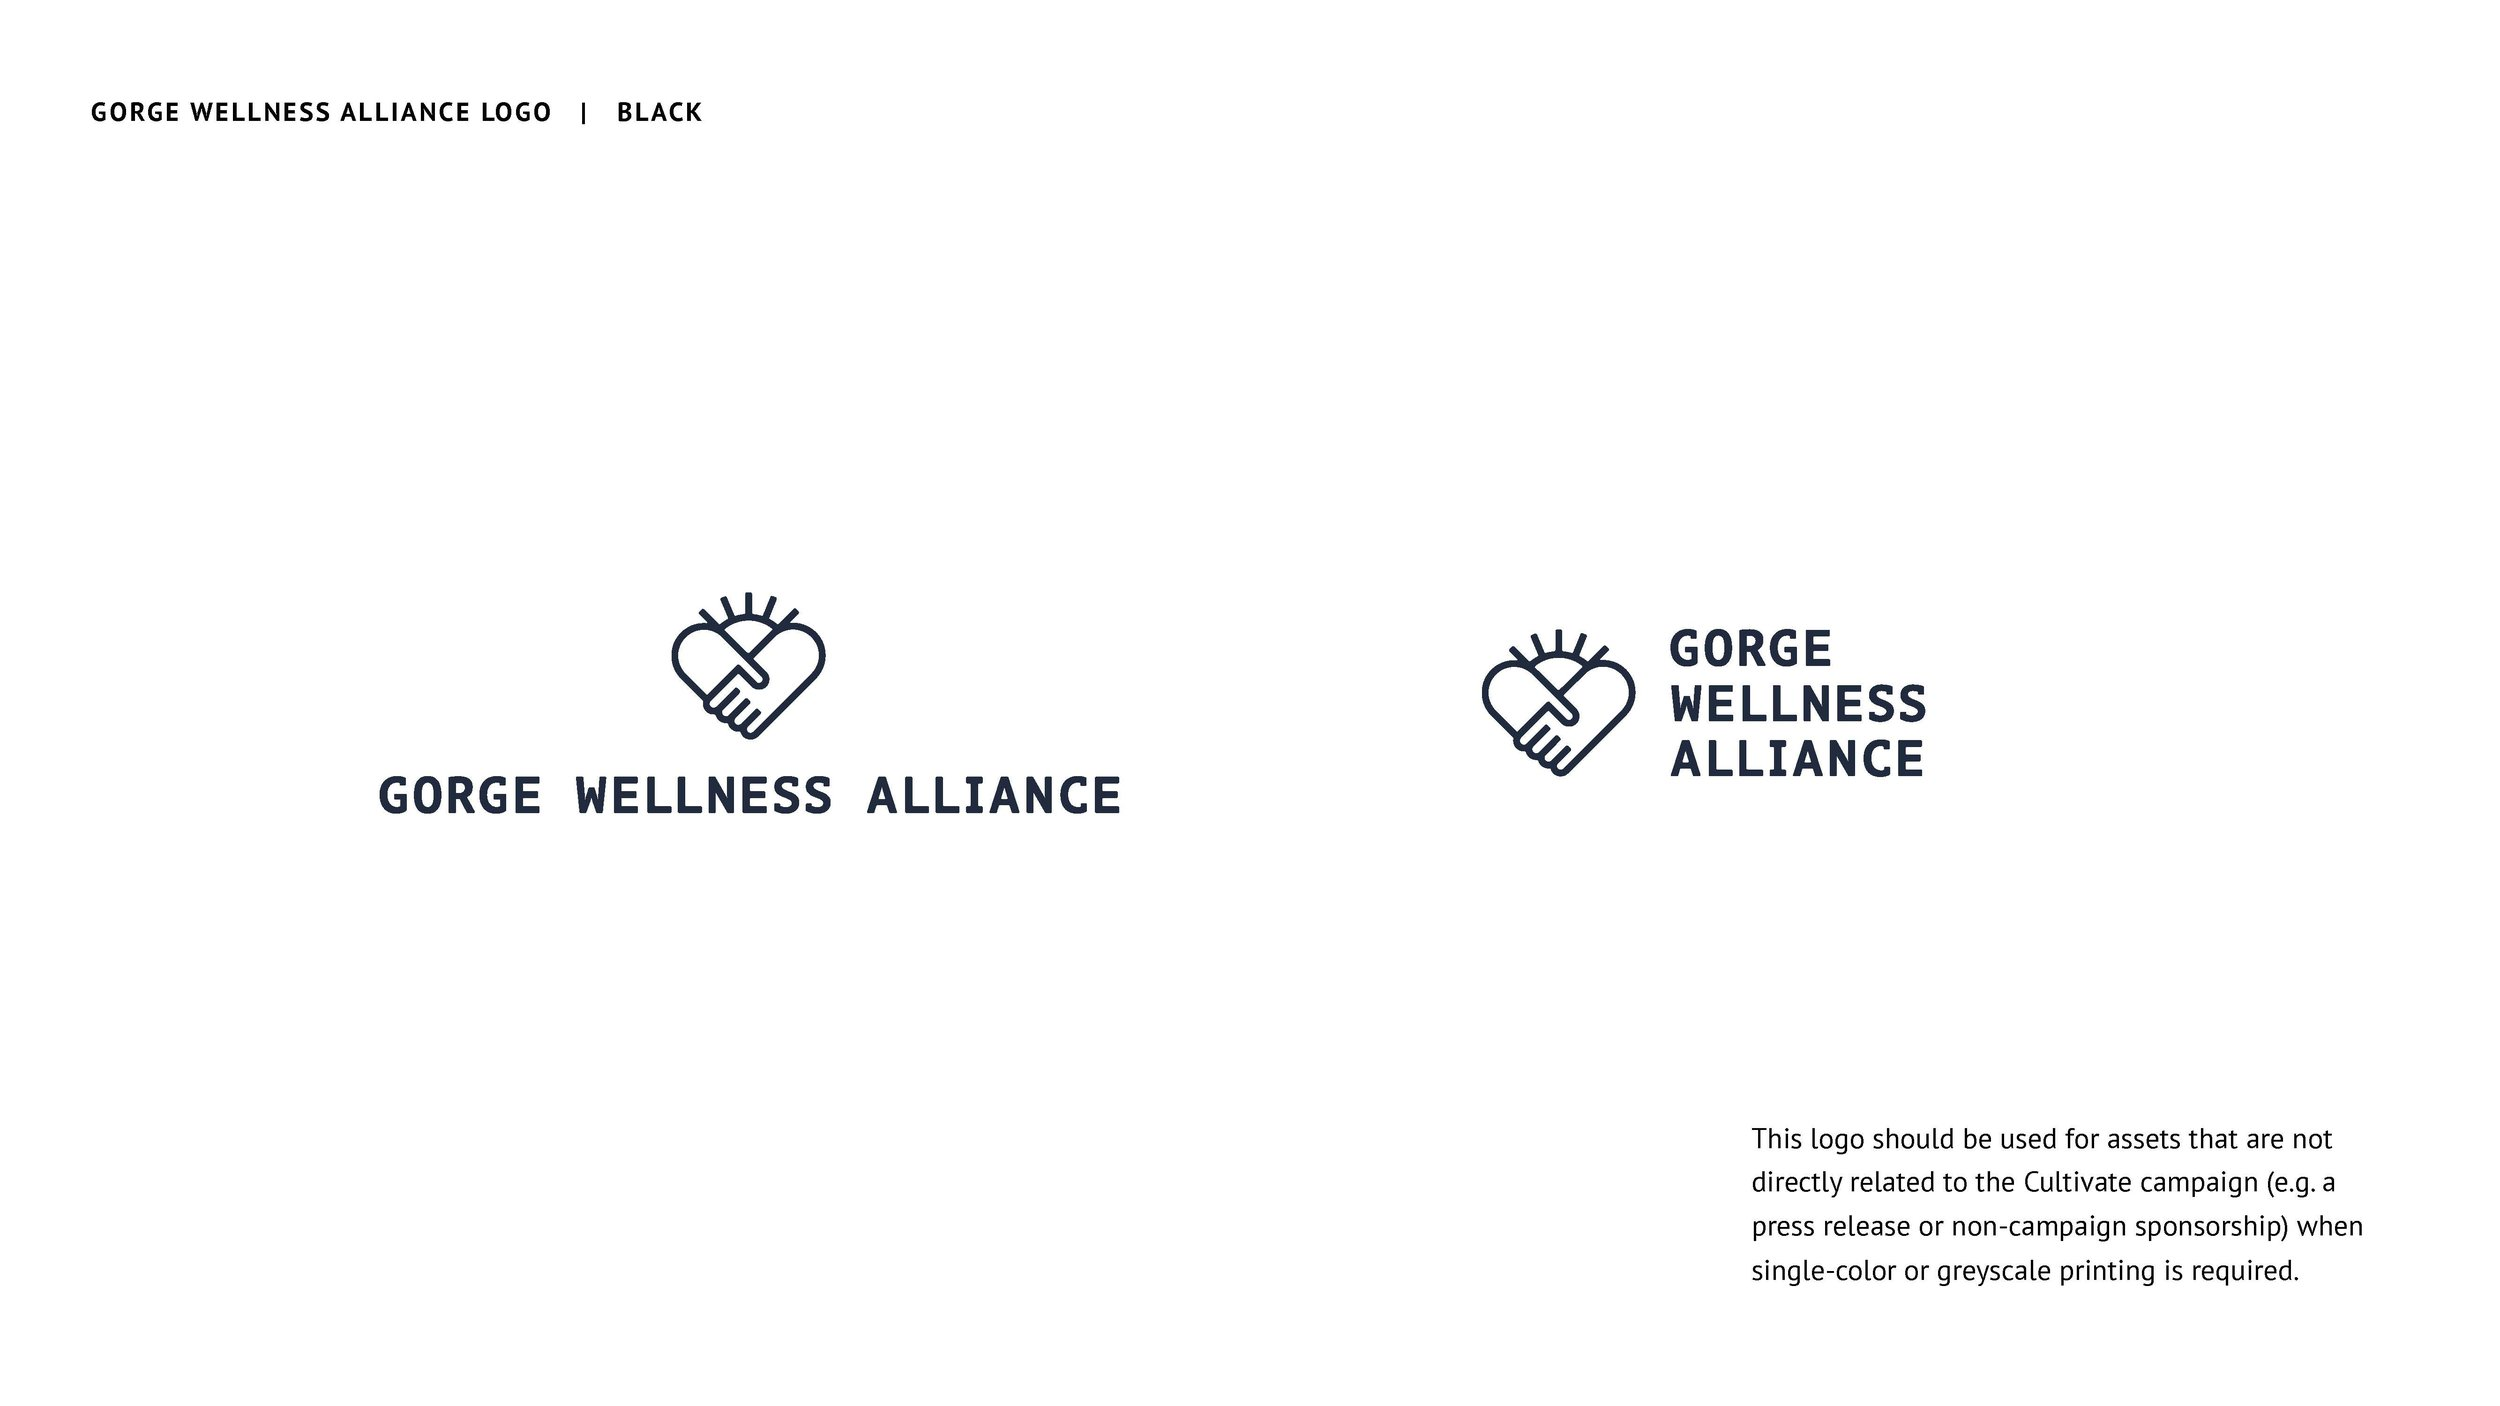 GWA_Brand Identity_Page_13.jpg